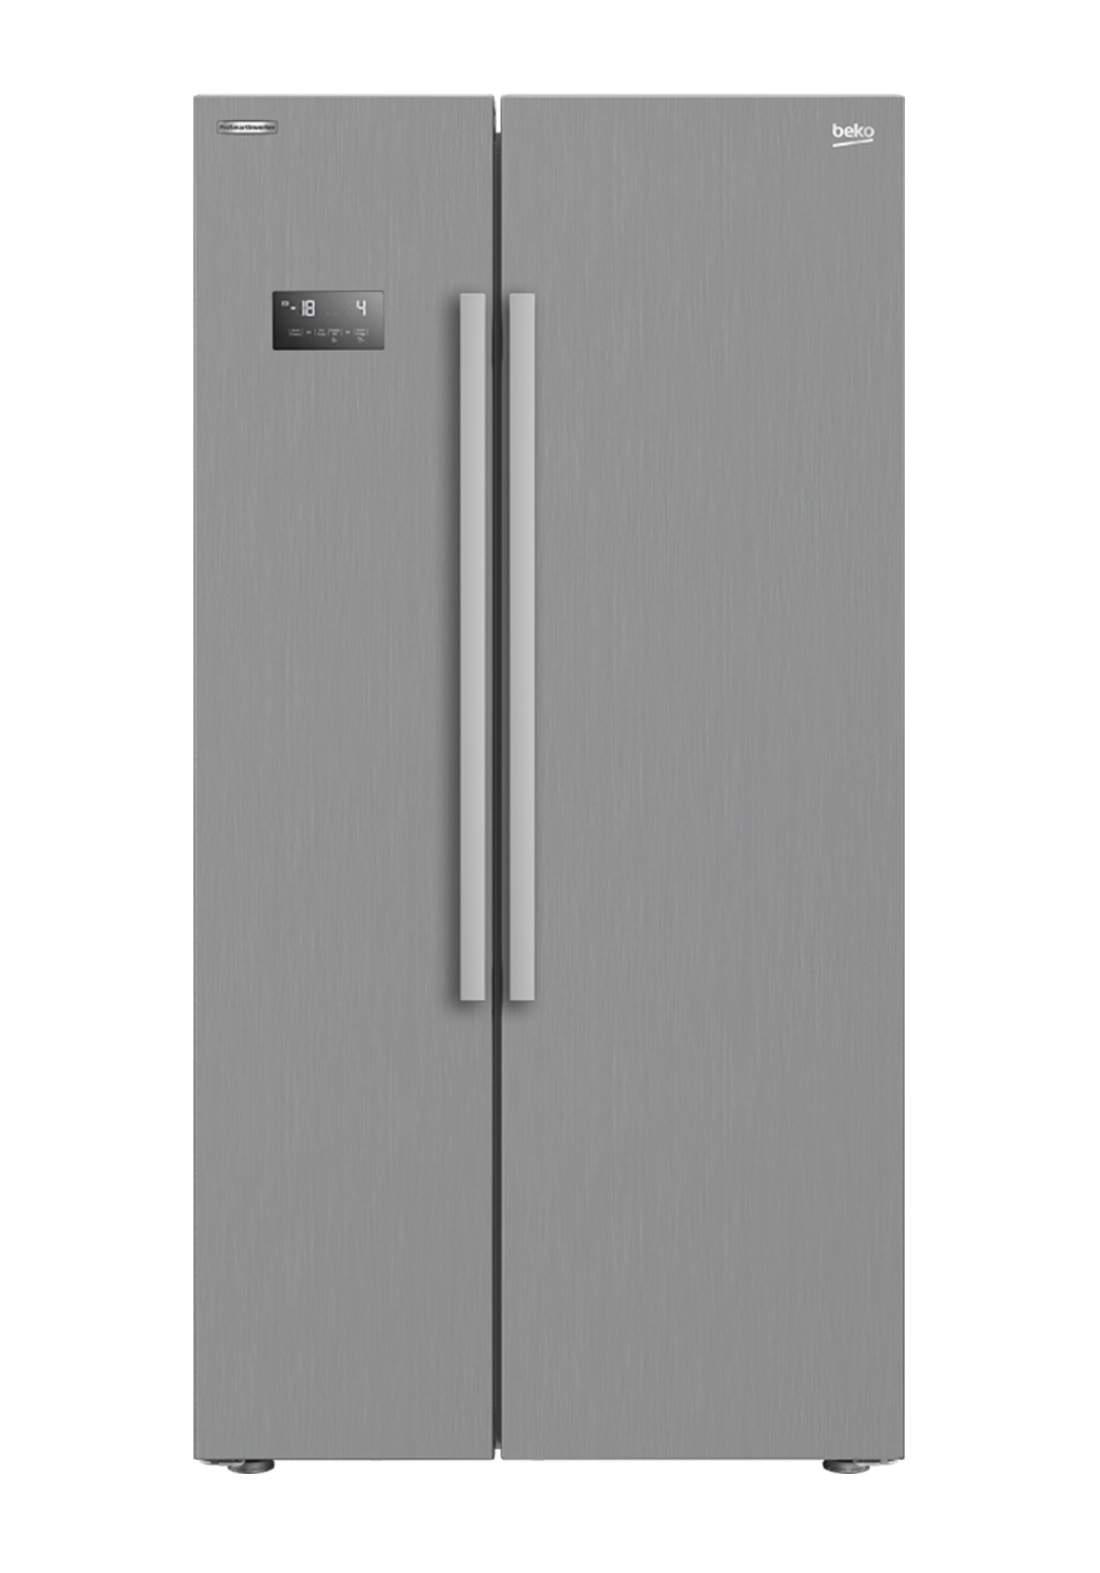 Beko  GN 164021 XB Refrigerator 640 L - Gray ثلاجة